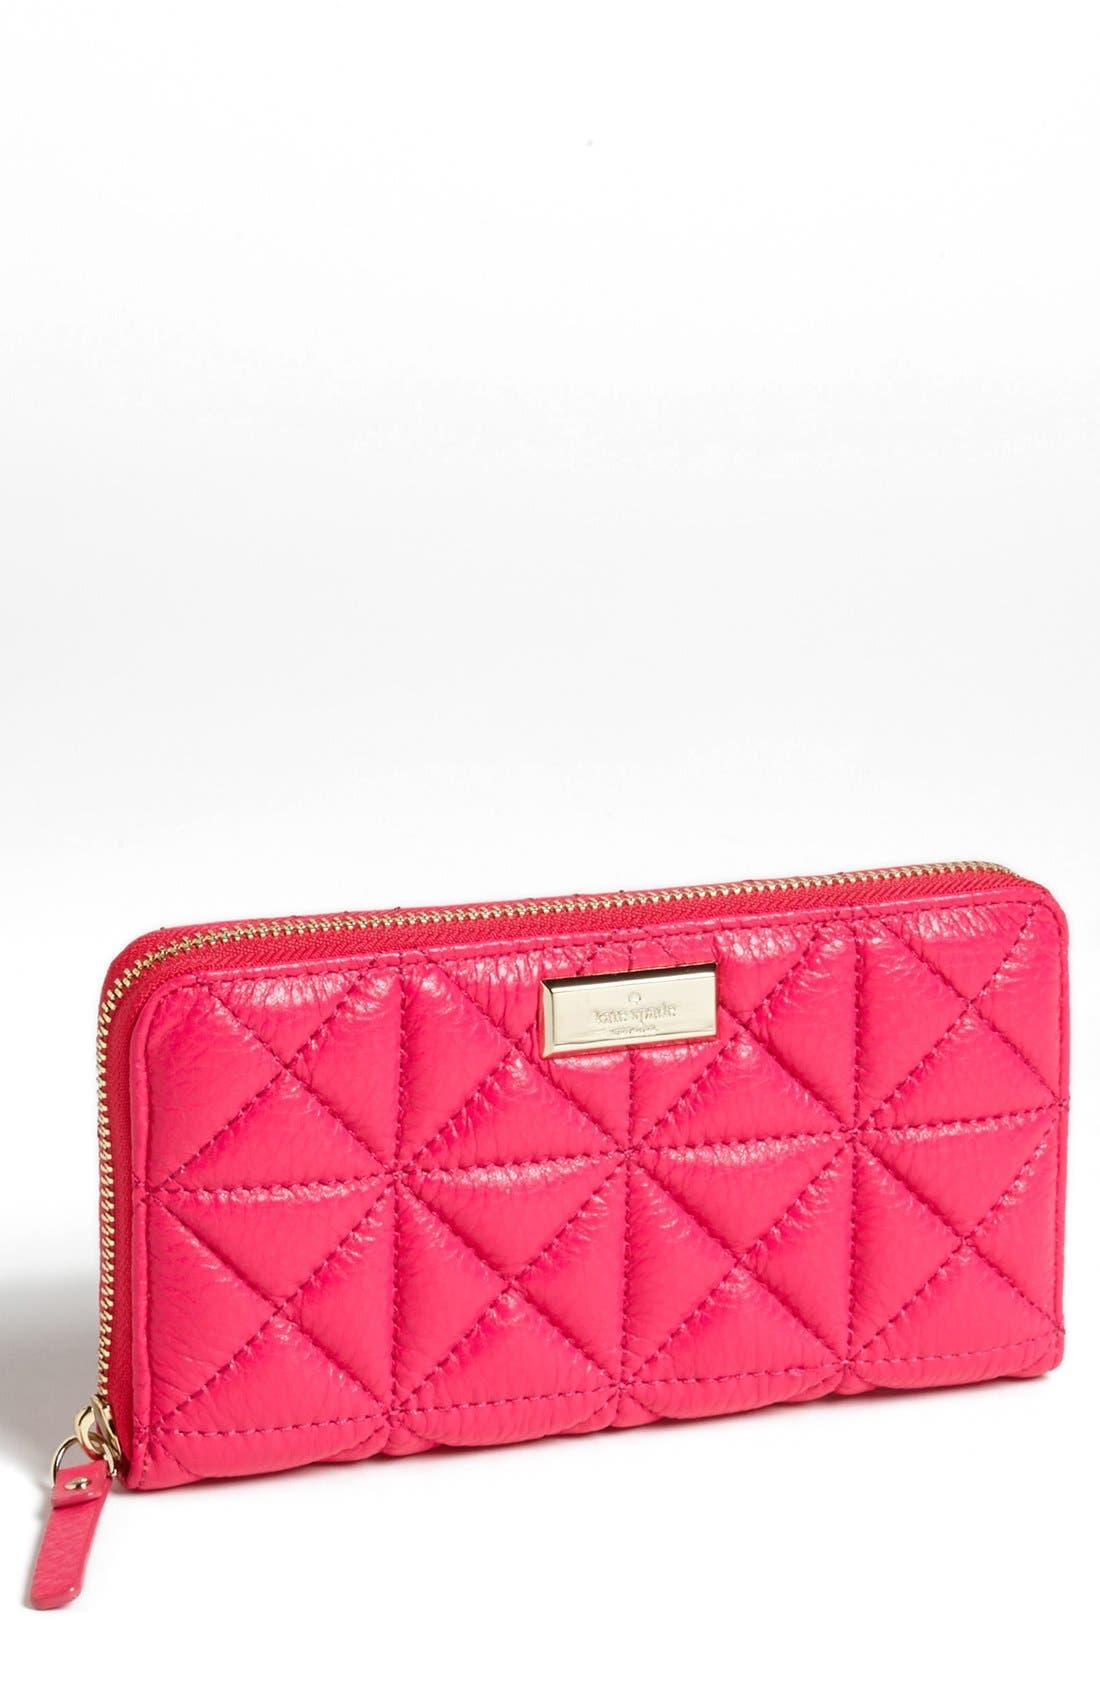 Main Image - kate spade new york 'sedgwick place - lacey' zip around wallet